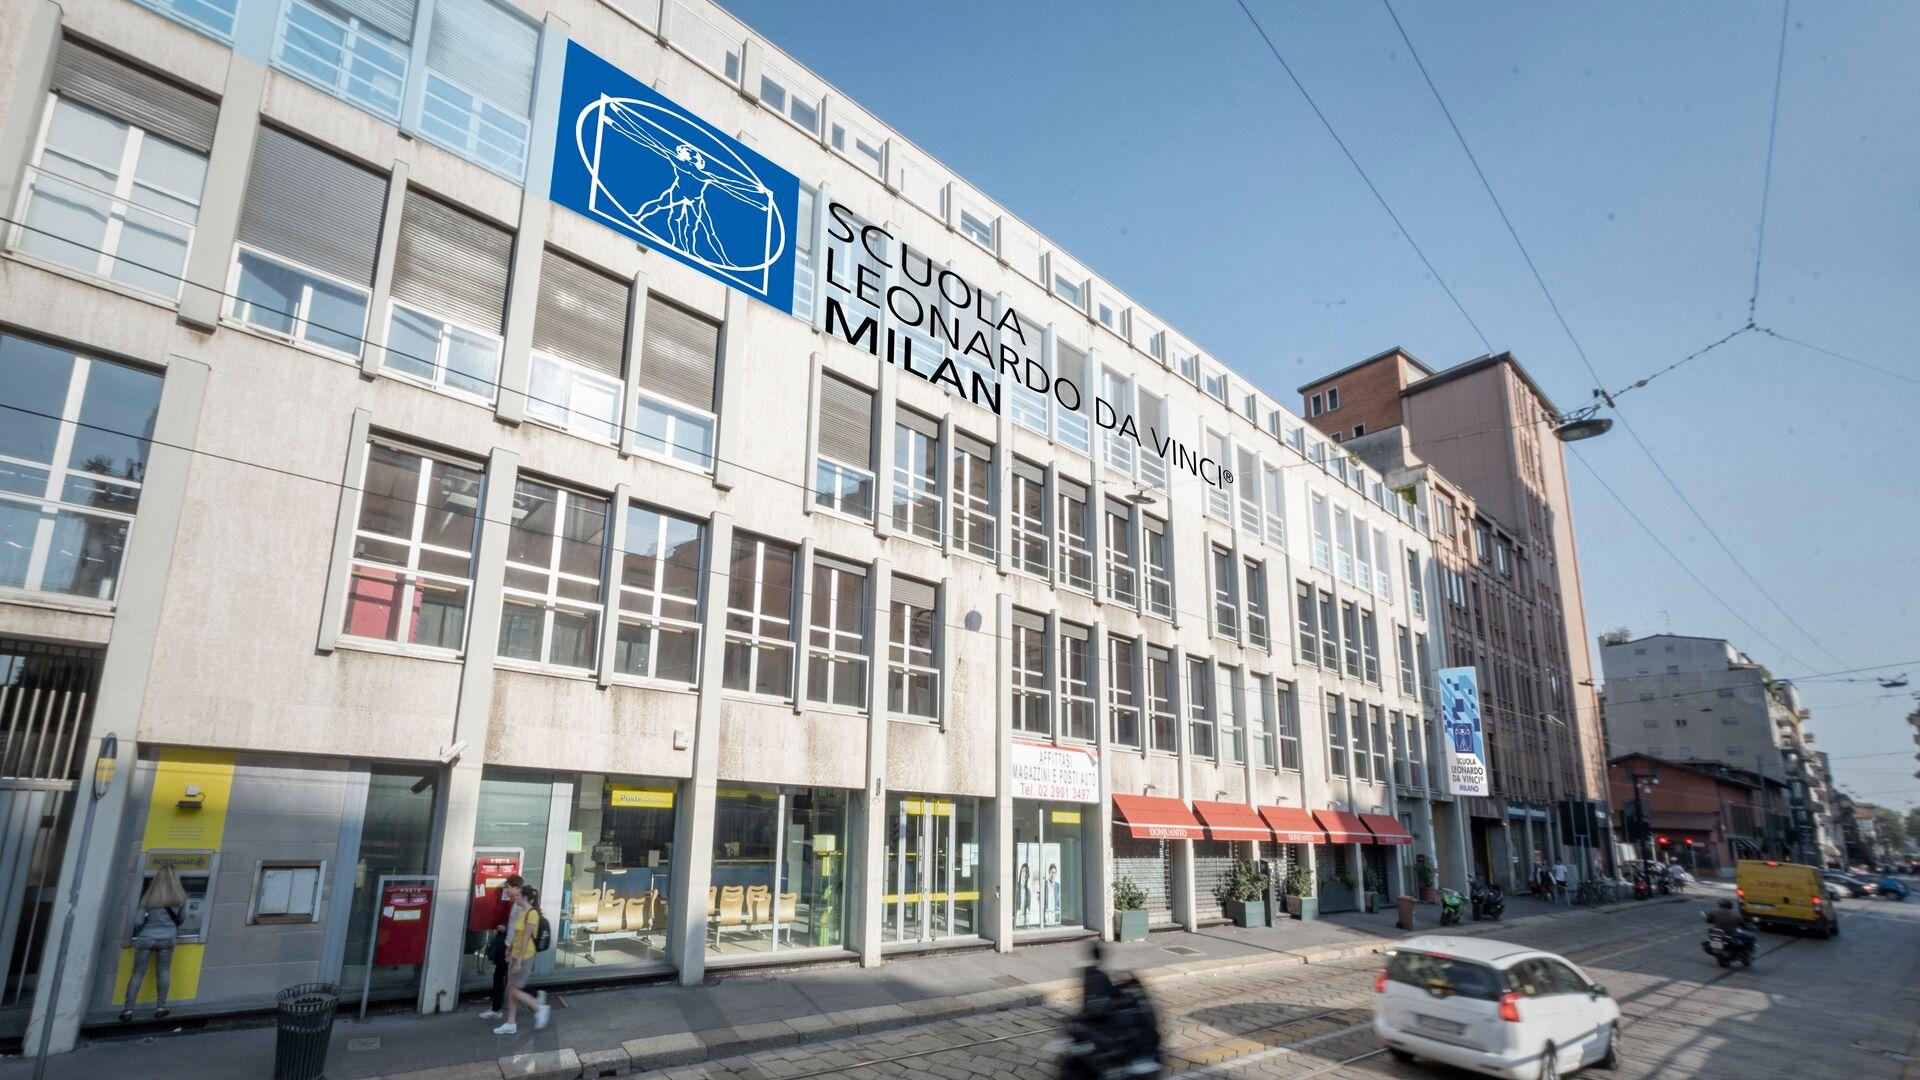 Séjour linguistique Italie, Milan - Scuola Leonardo da Vinci Milano - École